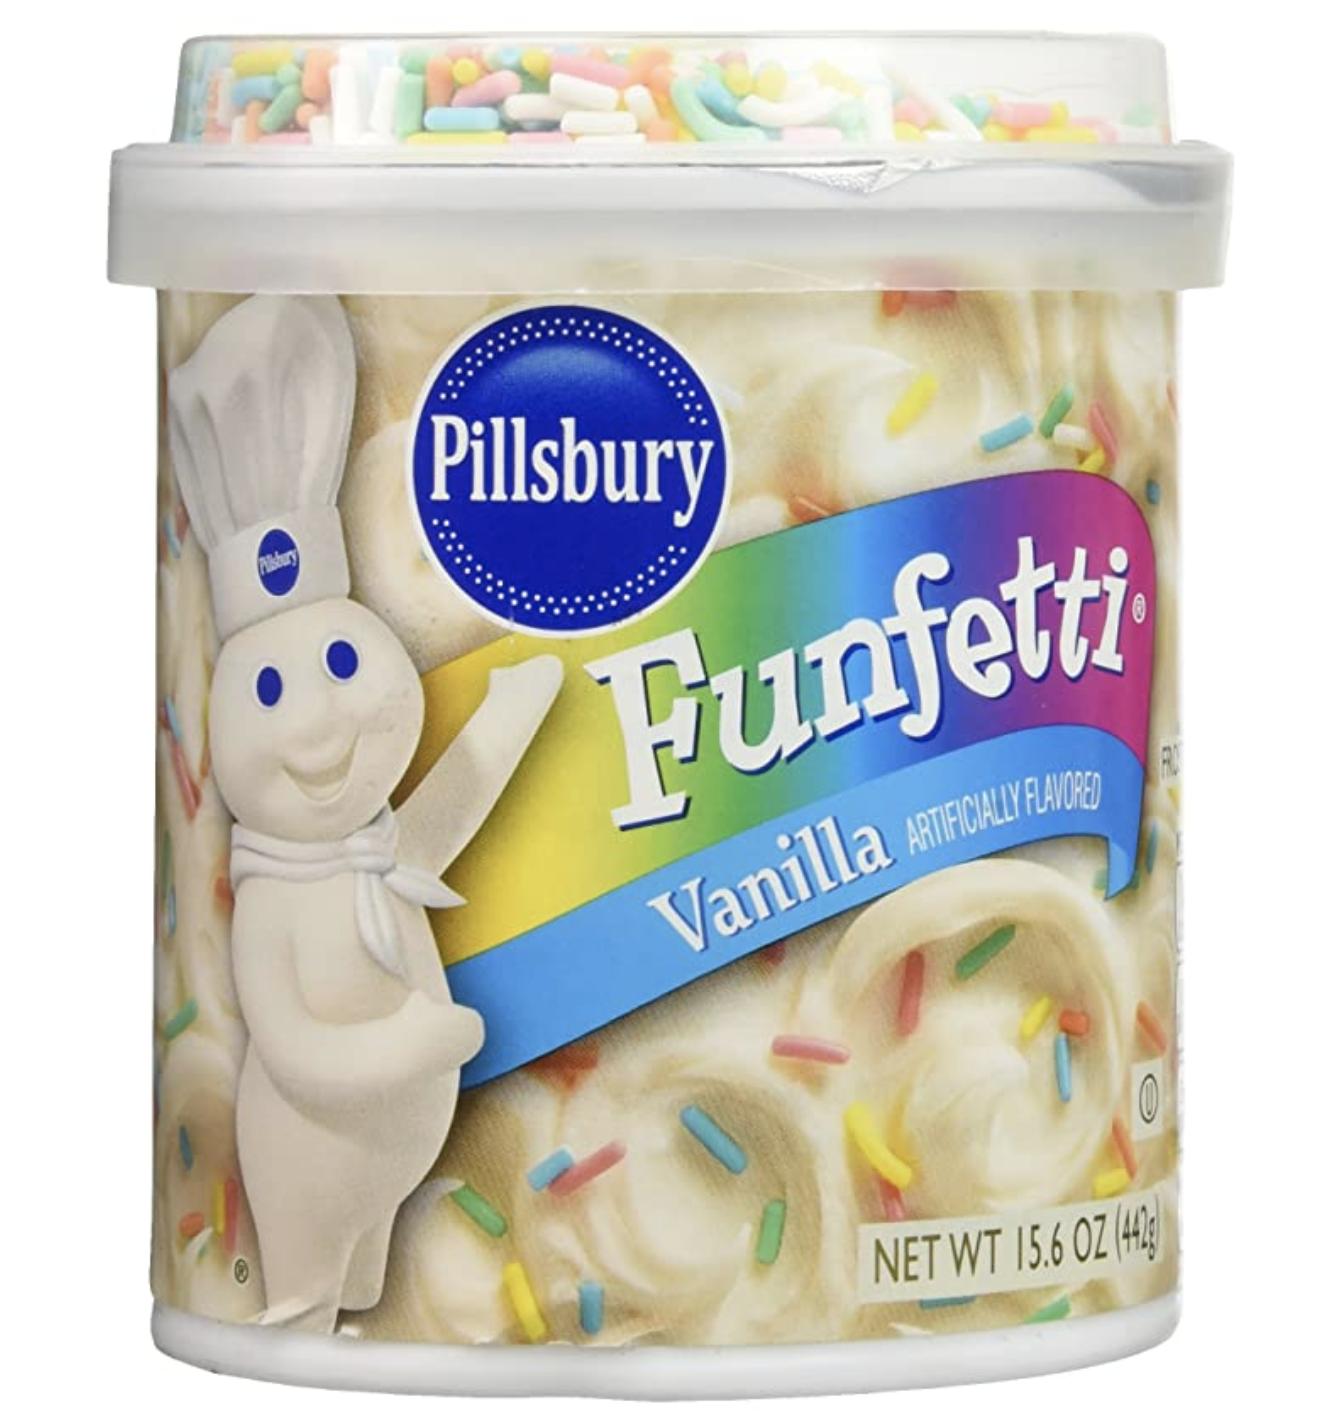 A jar of Pillsbury Funfetti frosting